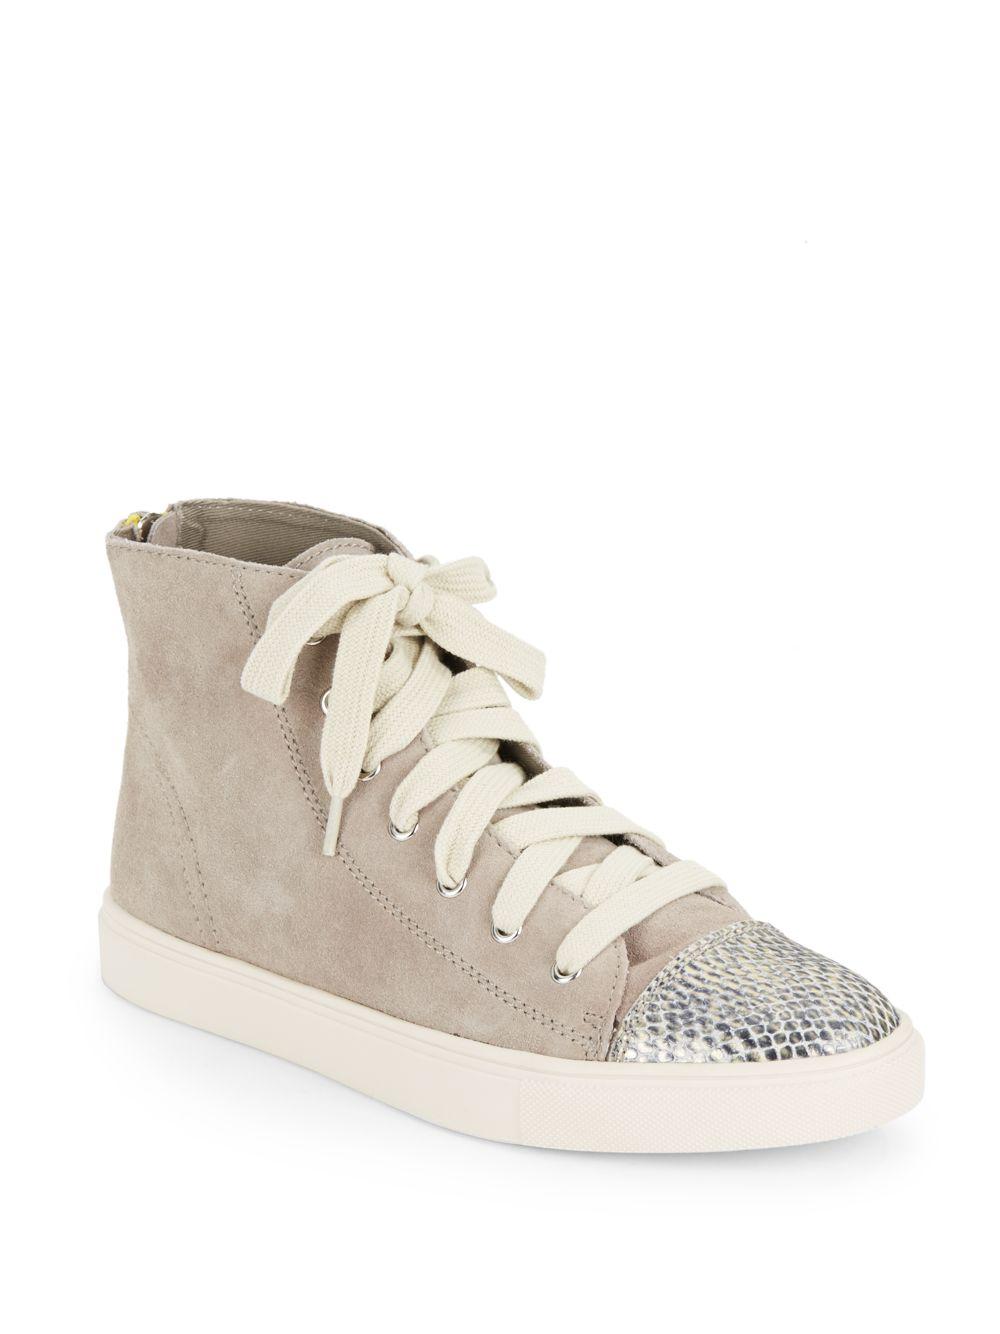 3de874b1a9a Lyst - Steve Madden Eastman Leather   Snake-Print Cap-Toe Sneakers ...